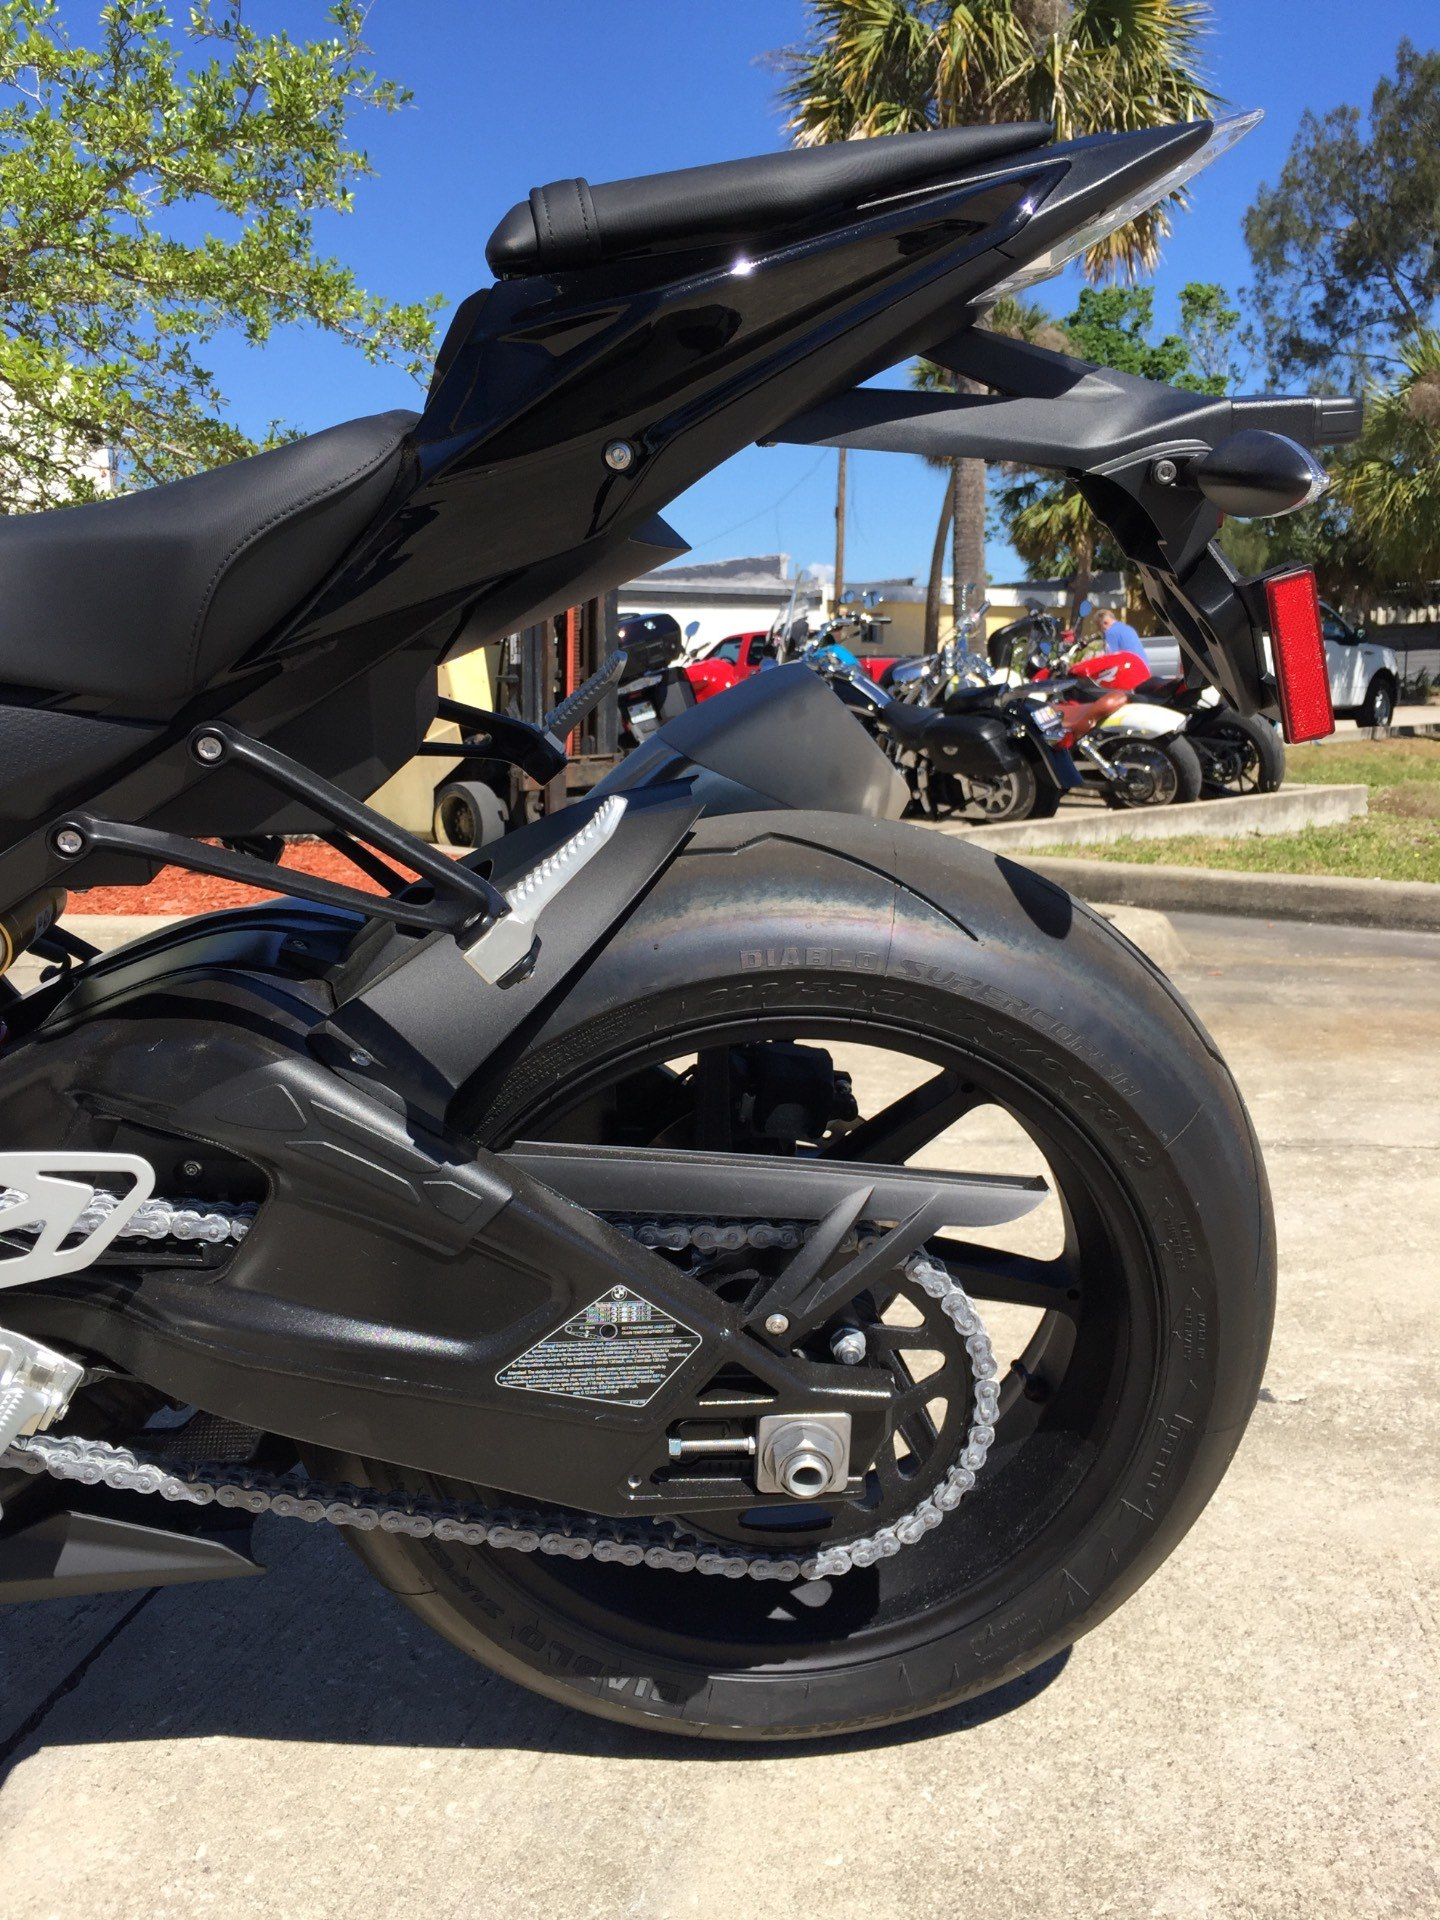 2016 BMW S 1000 RR in Daytona Beach, Florida